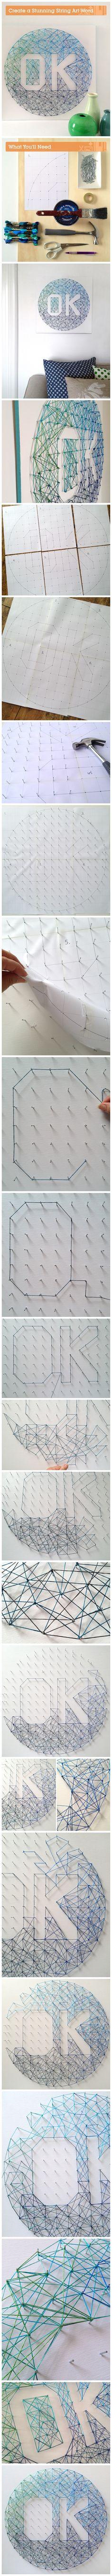 How to #Diy Statemnt #String #Art